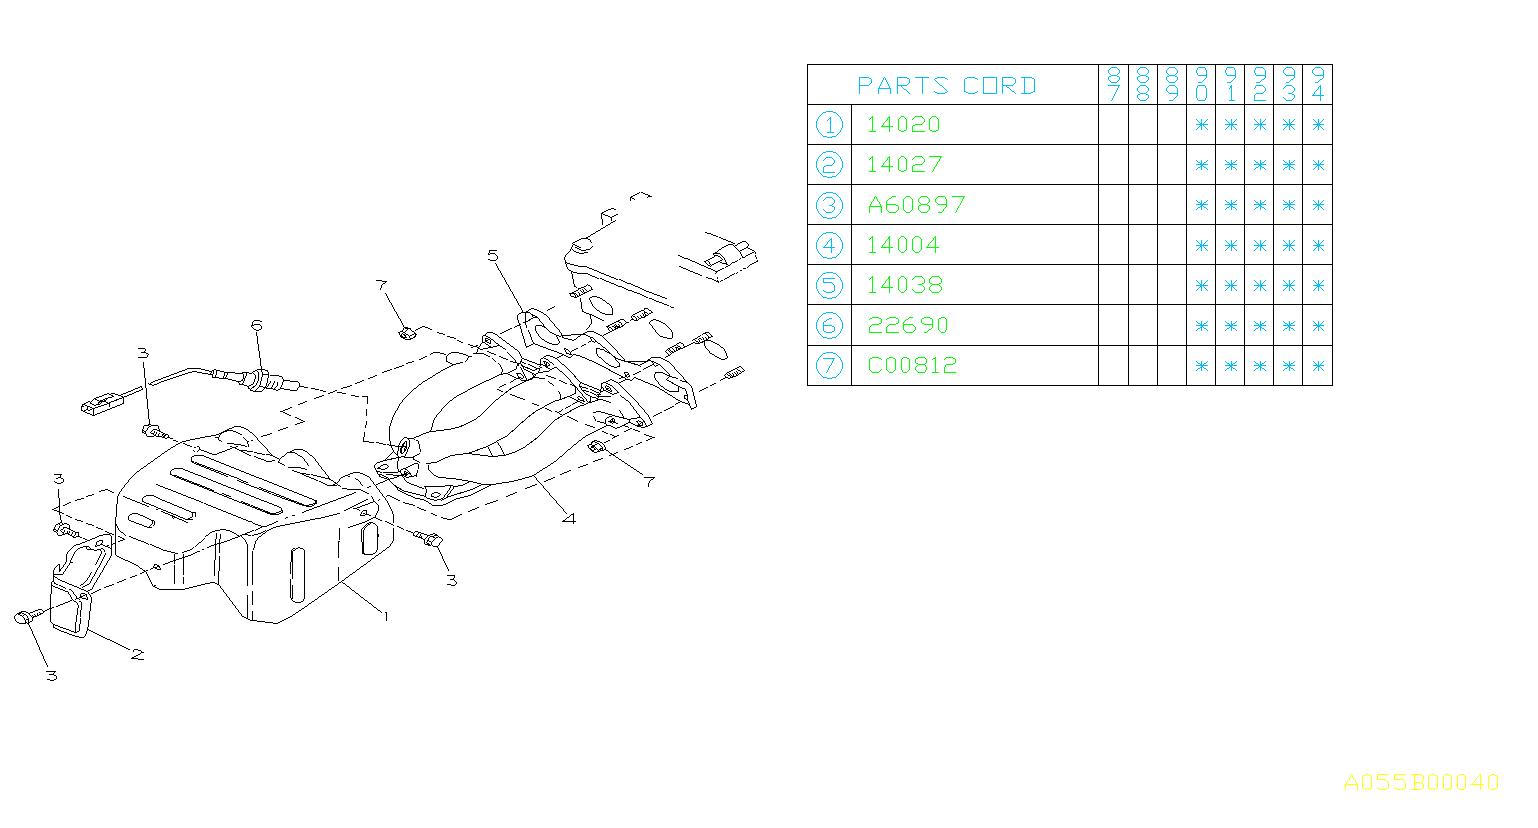 1990 Subaru Justy Nut  Manifold  Exhaust